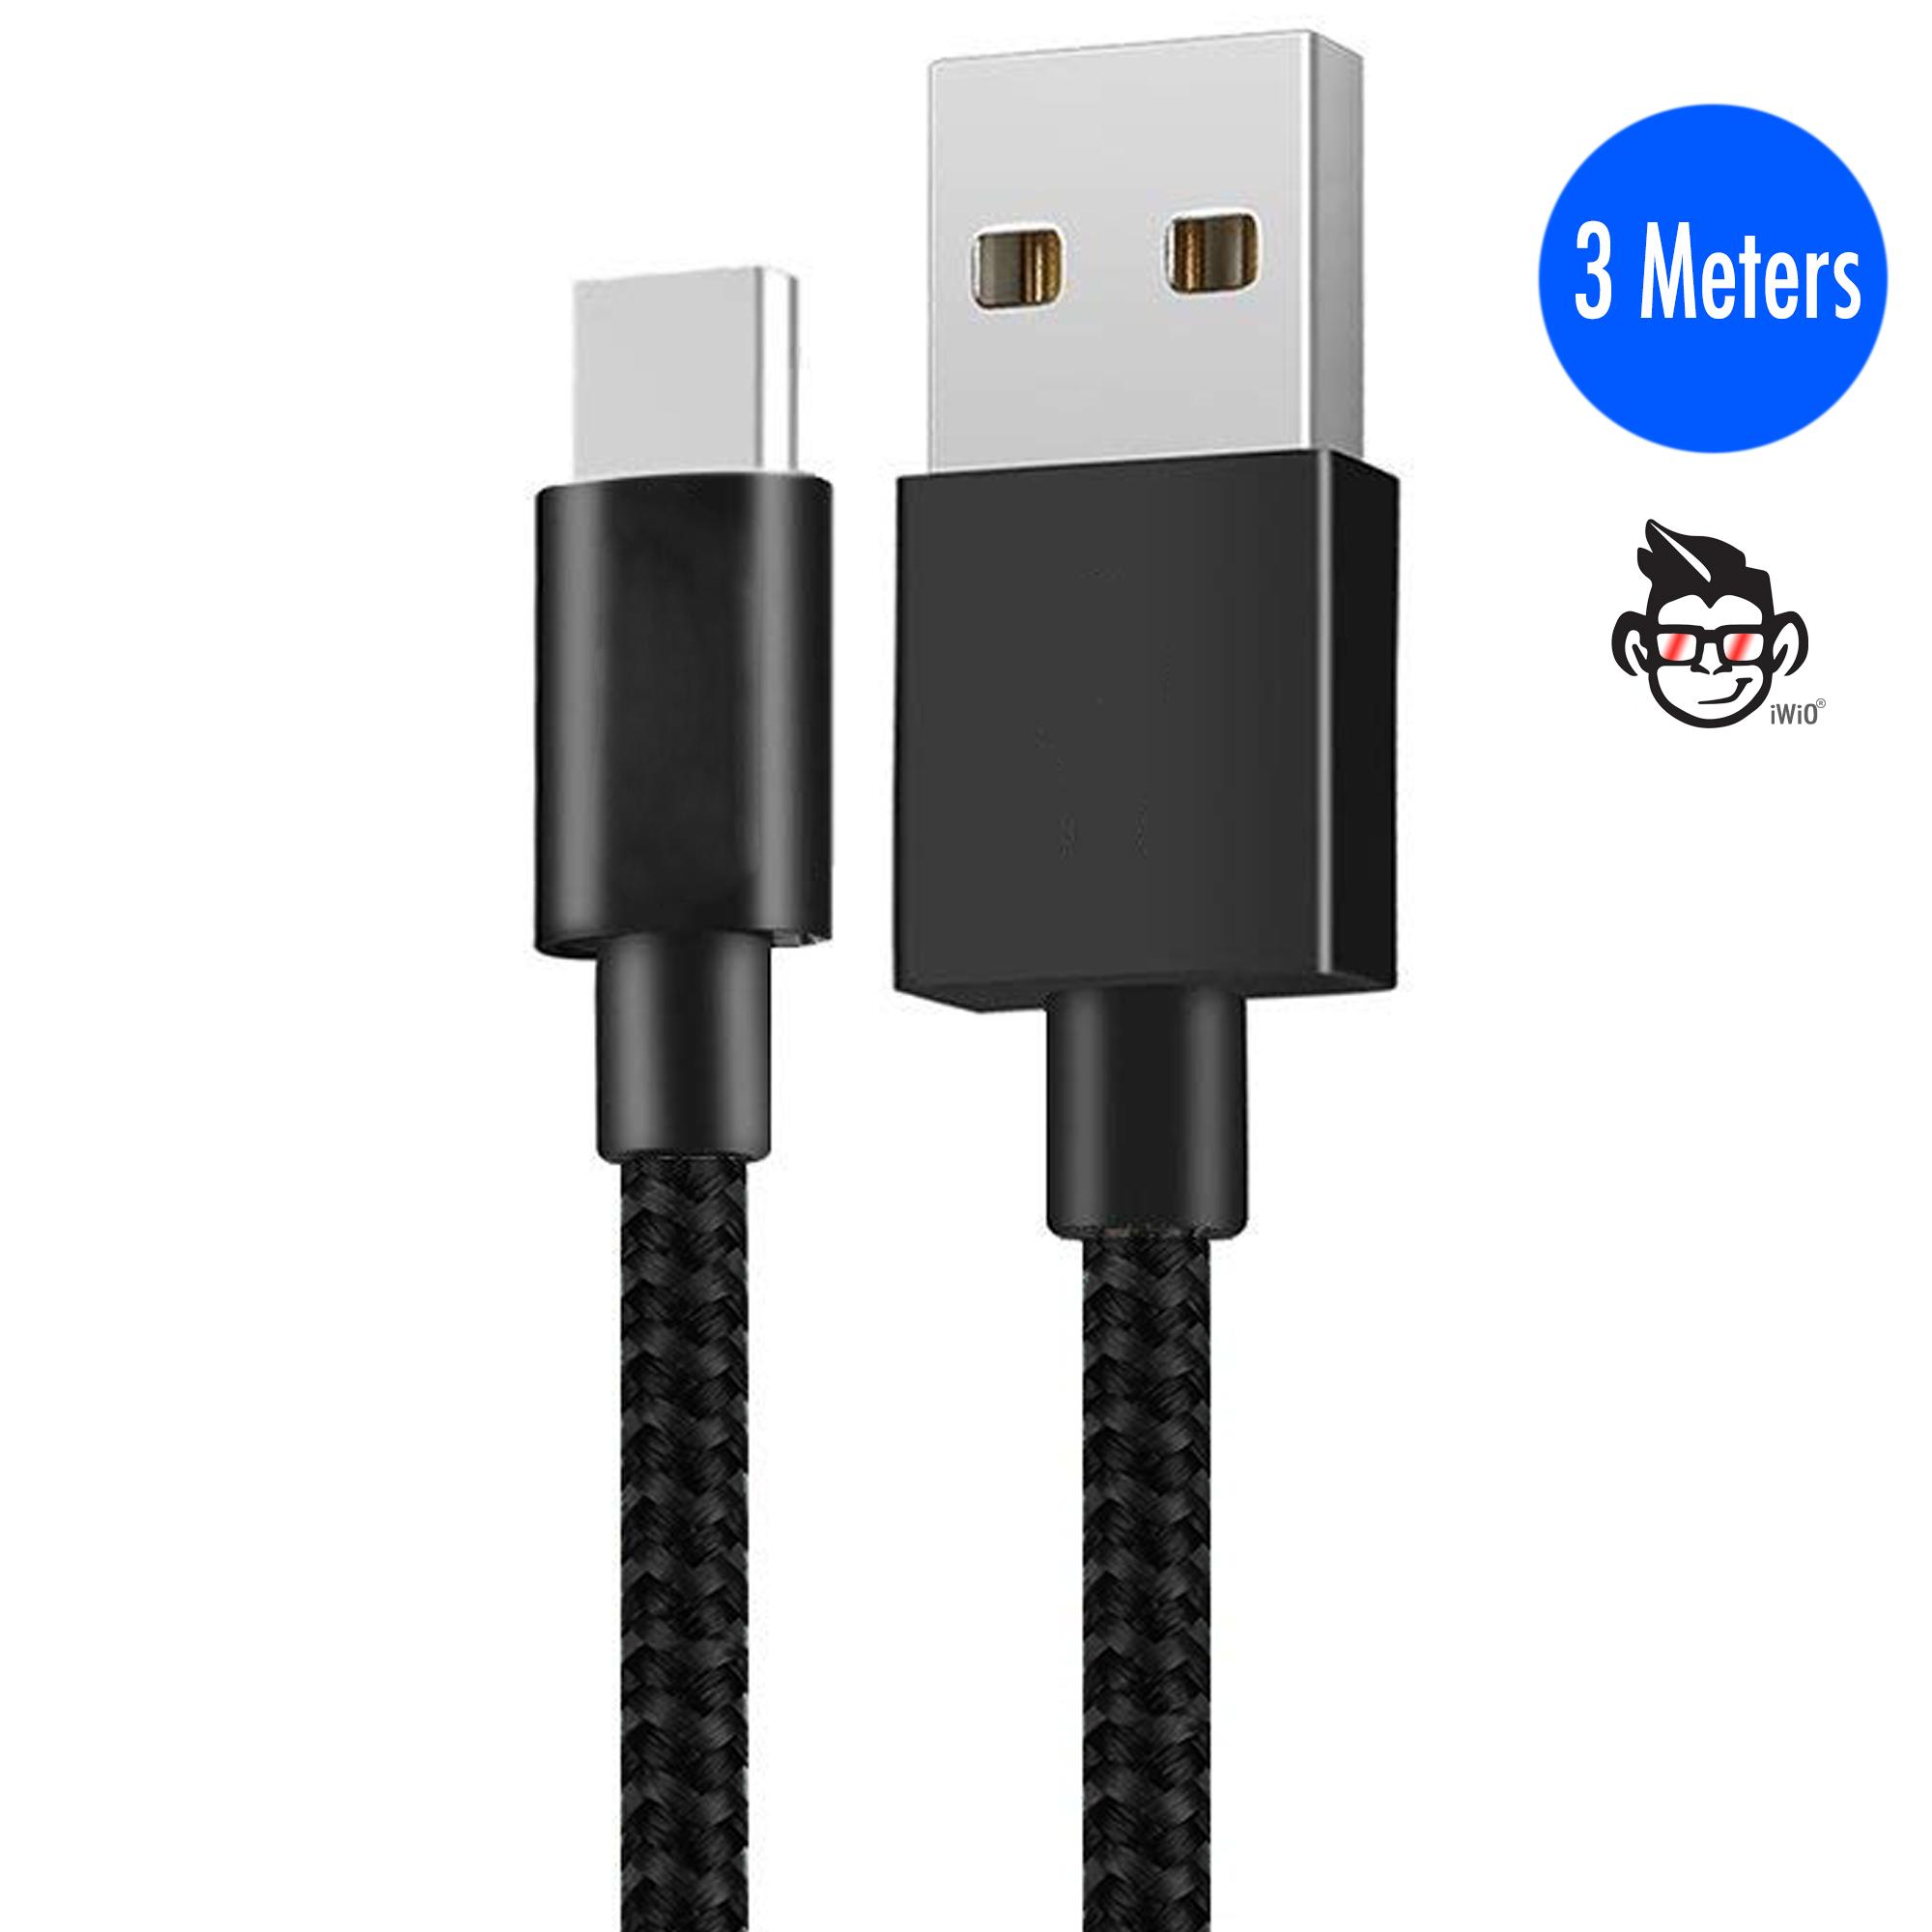 USB Type C To USB Cable Nylon Braided Charge For LG G5,Nexus 5X//6P,ZUK Z1 USB-C